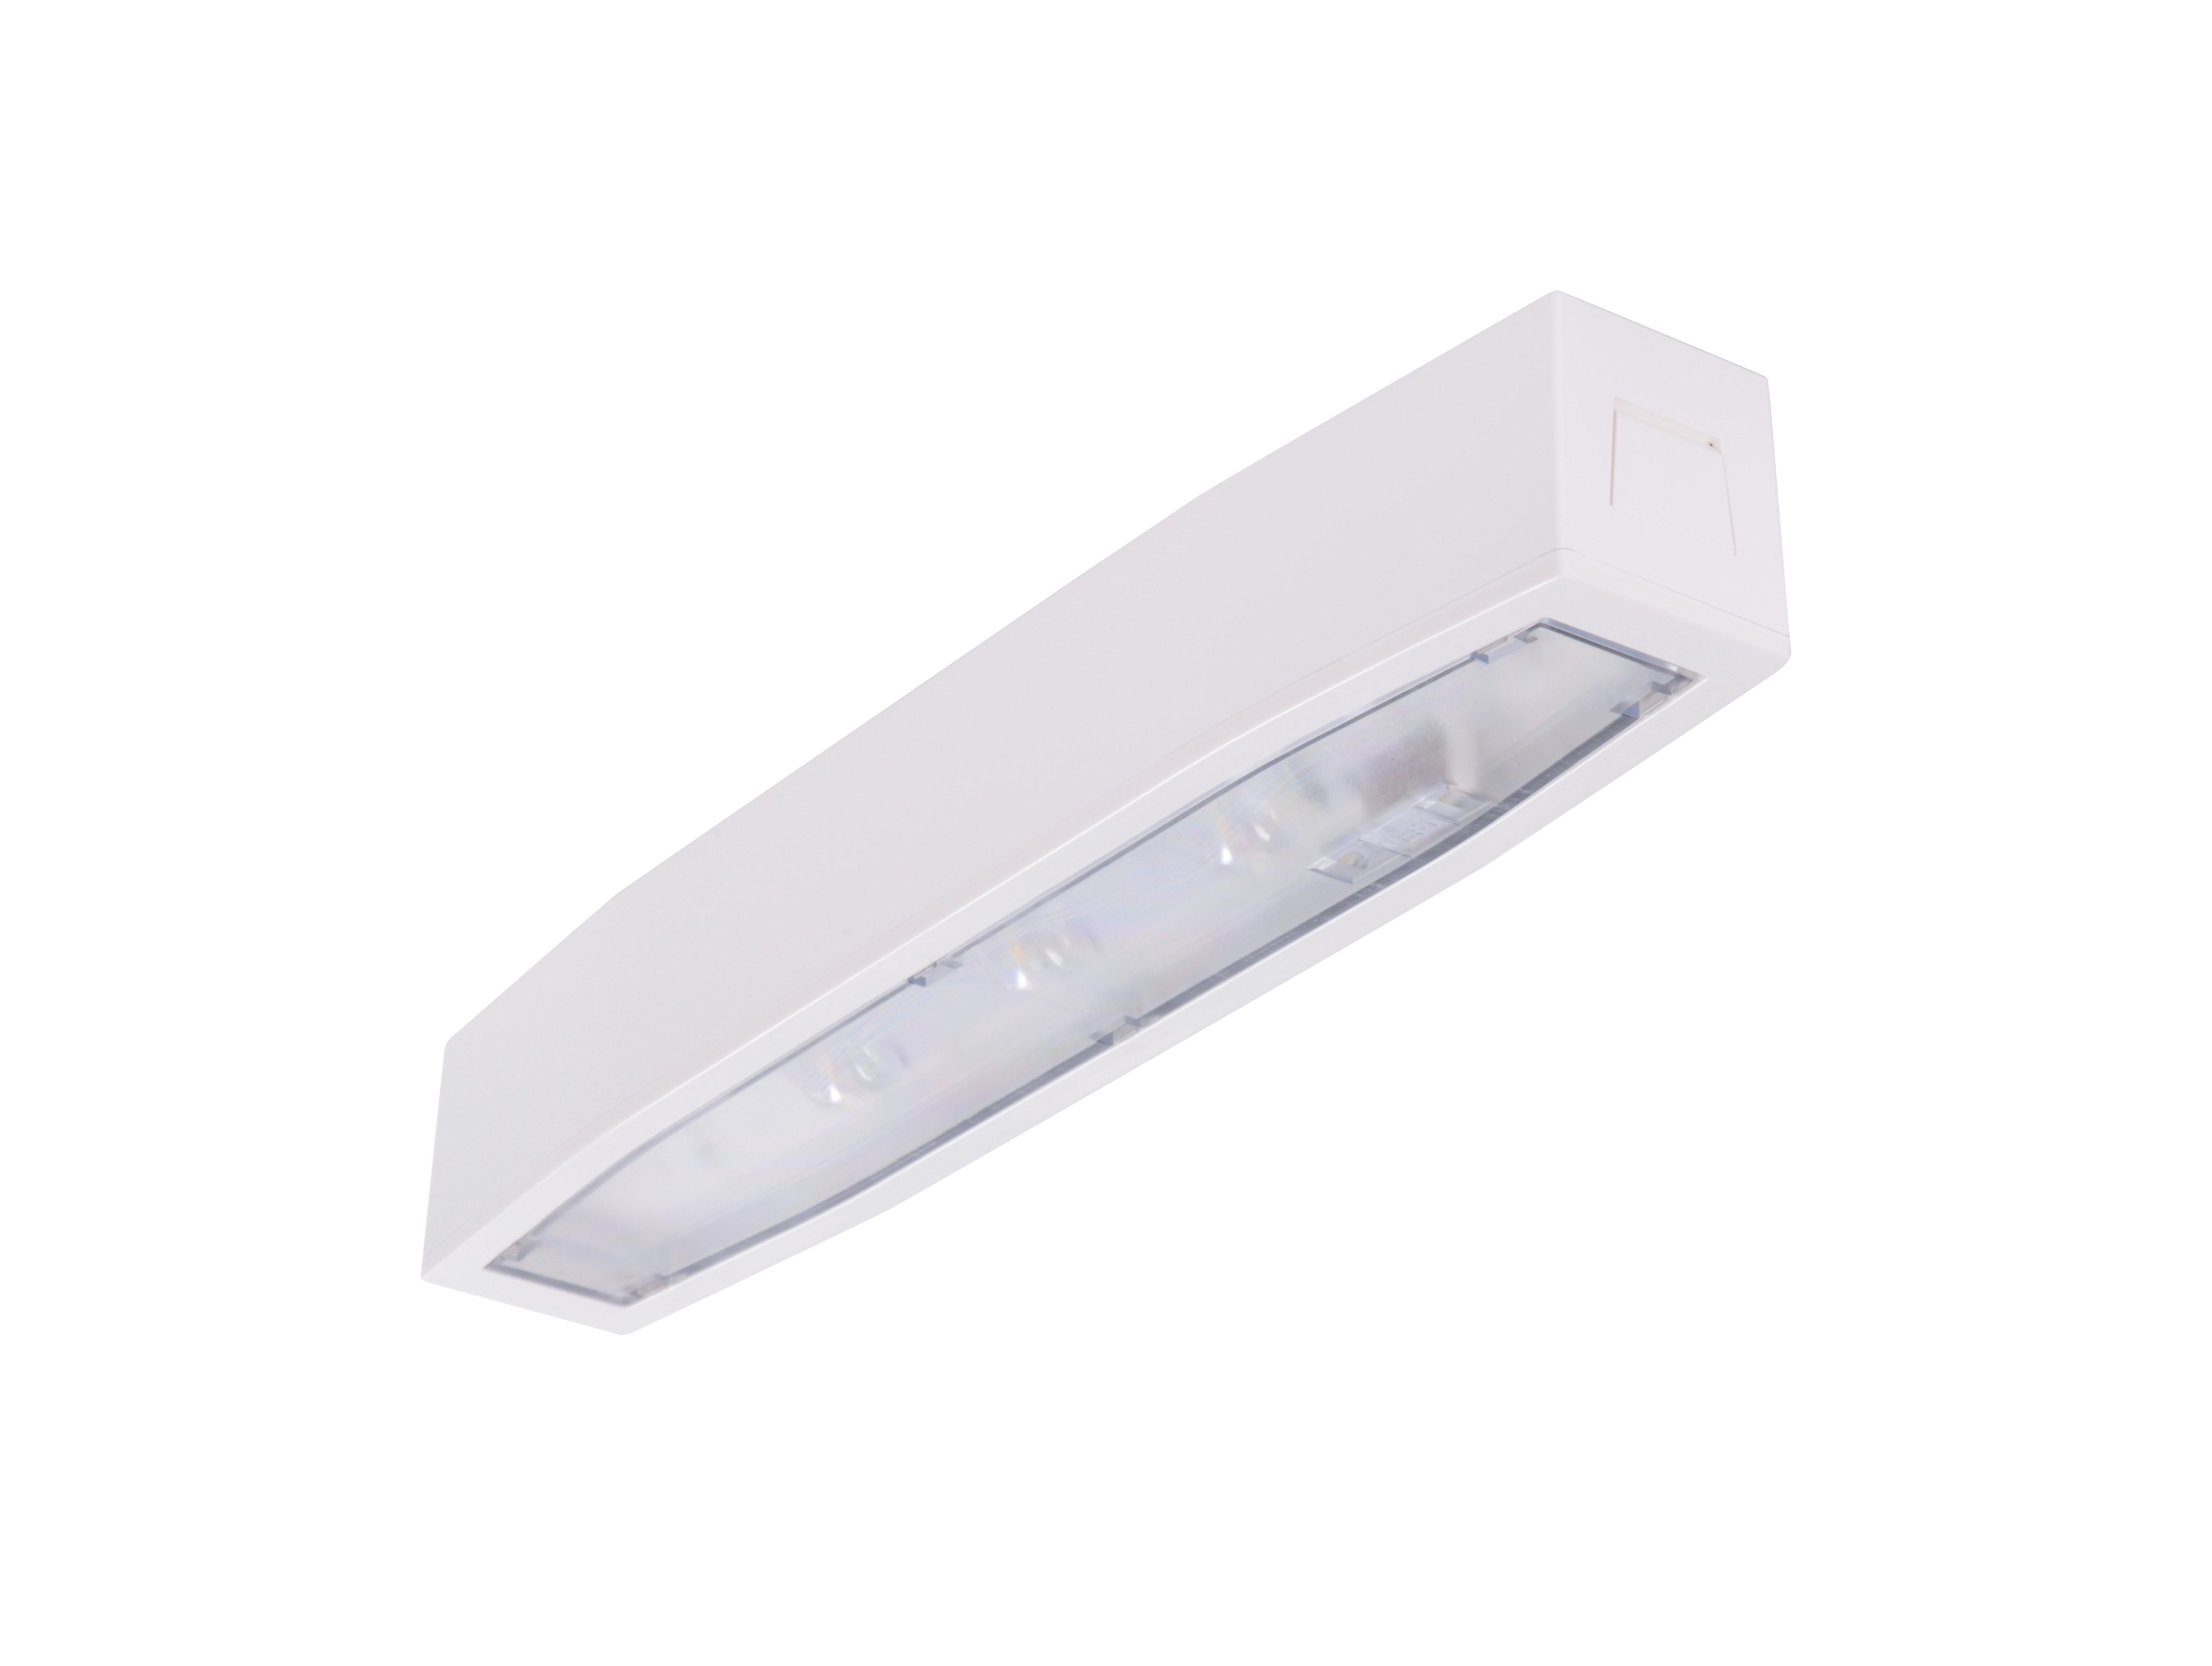 Lampa emergenta led Intelight 94573   3h nementinut test automat 0